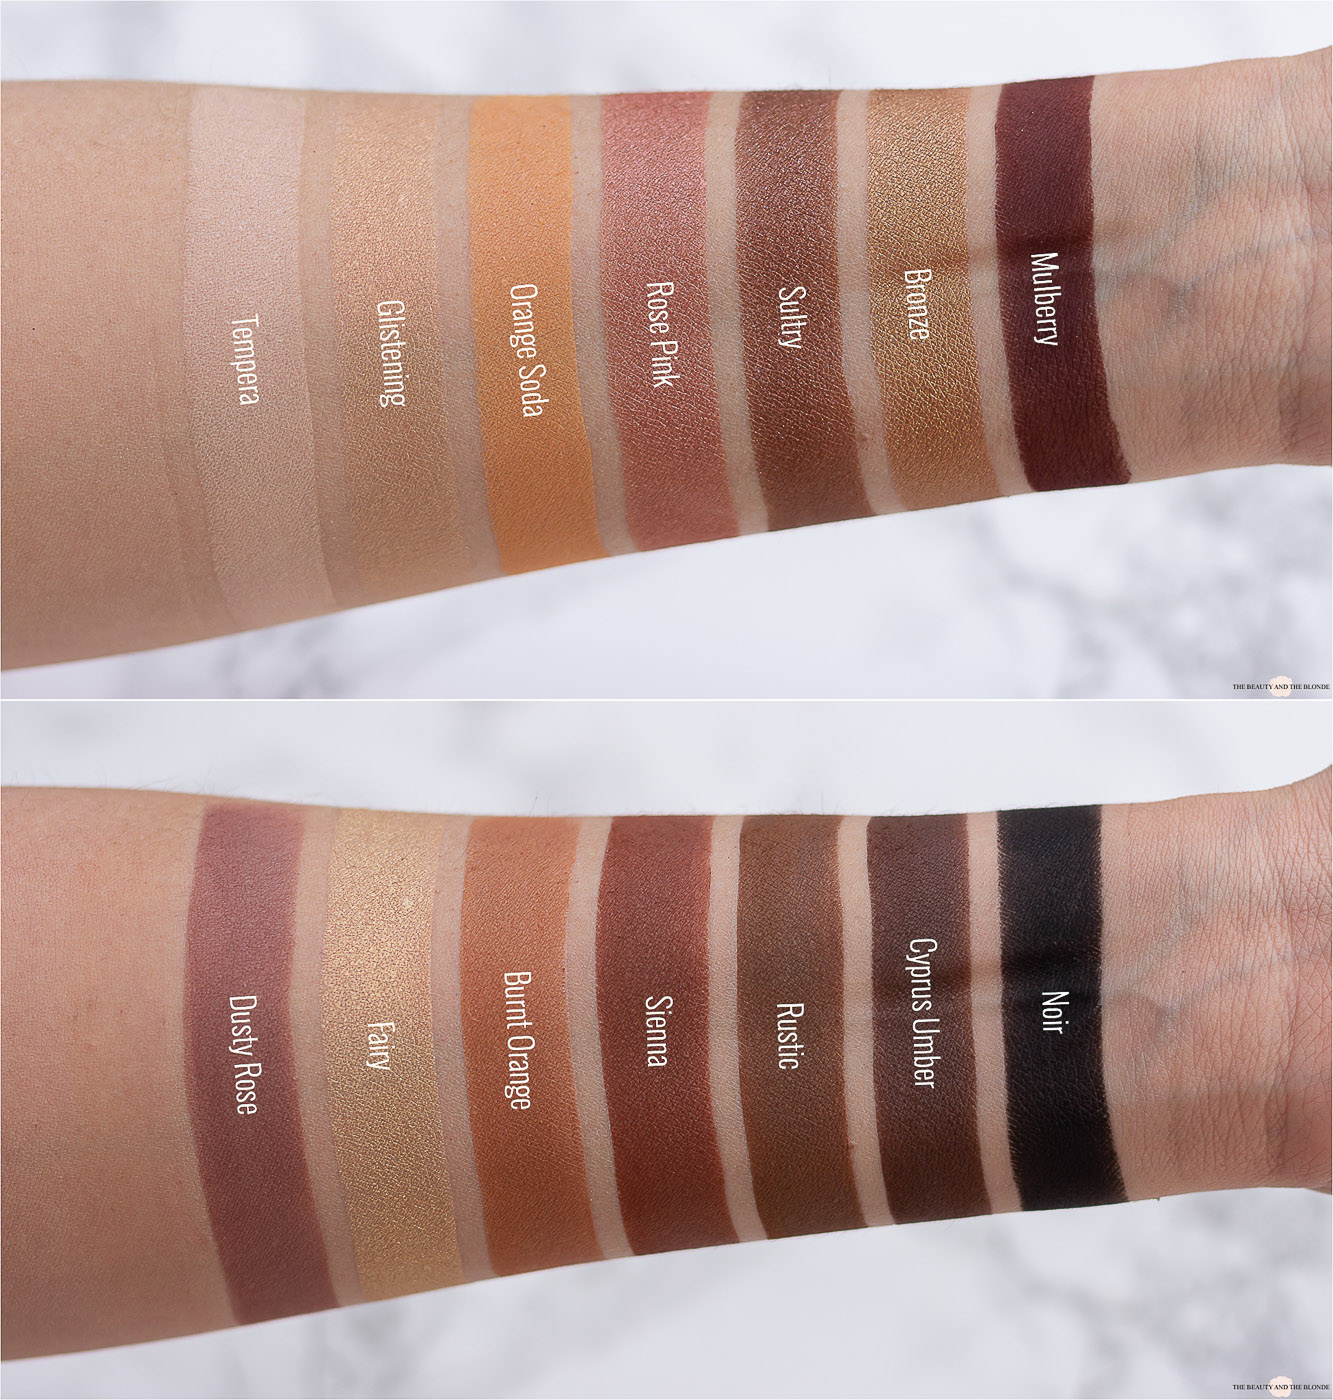 Anastasia Beverly Hills ABH Soft Glam Palette Swatches